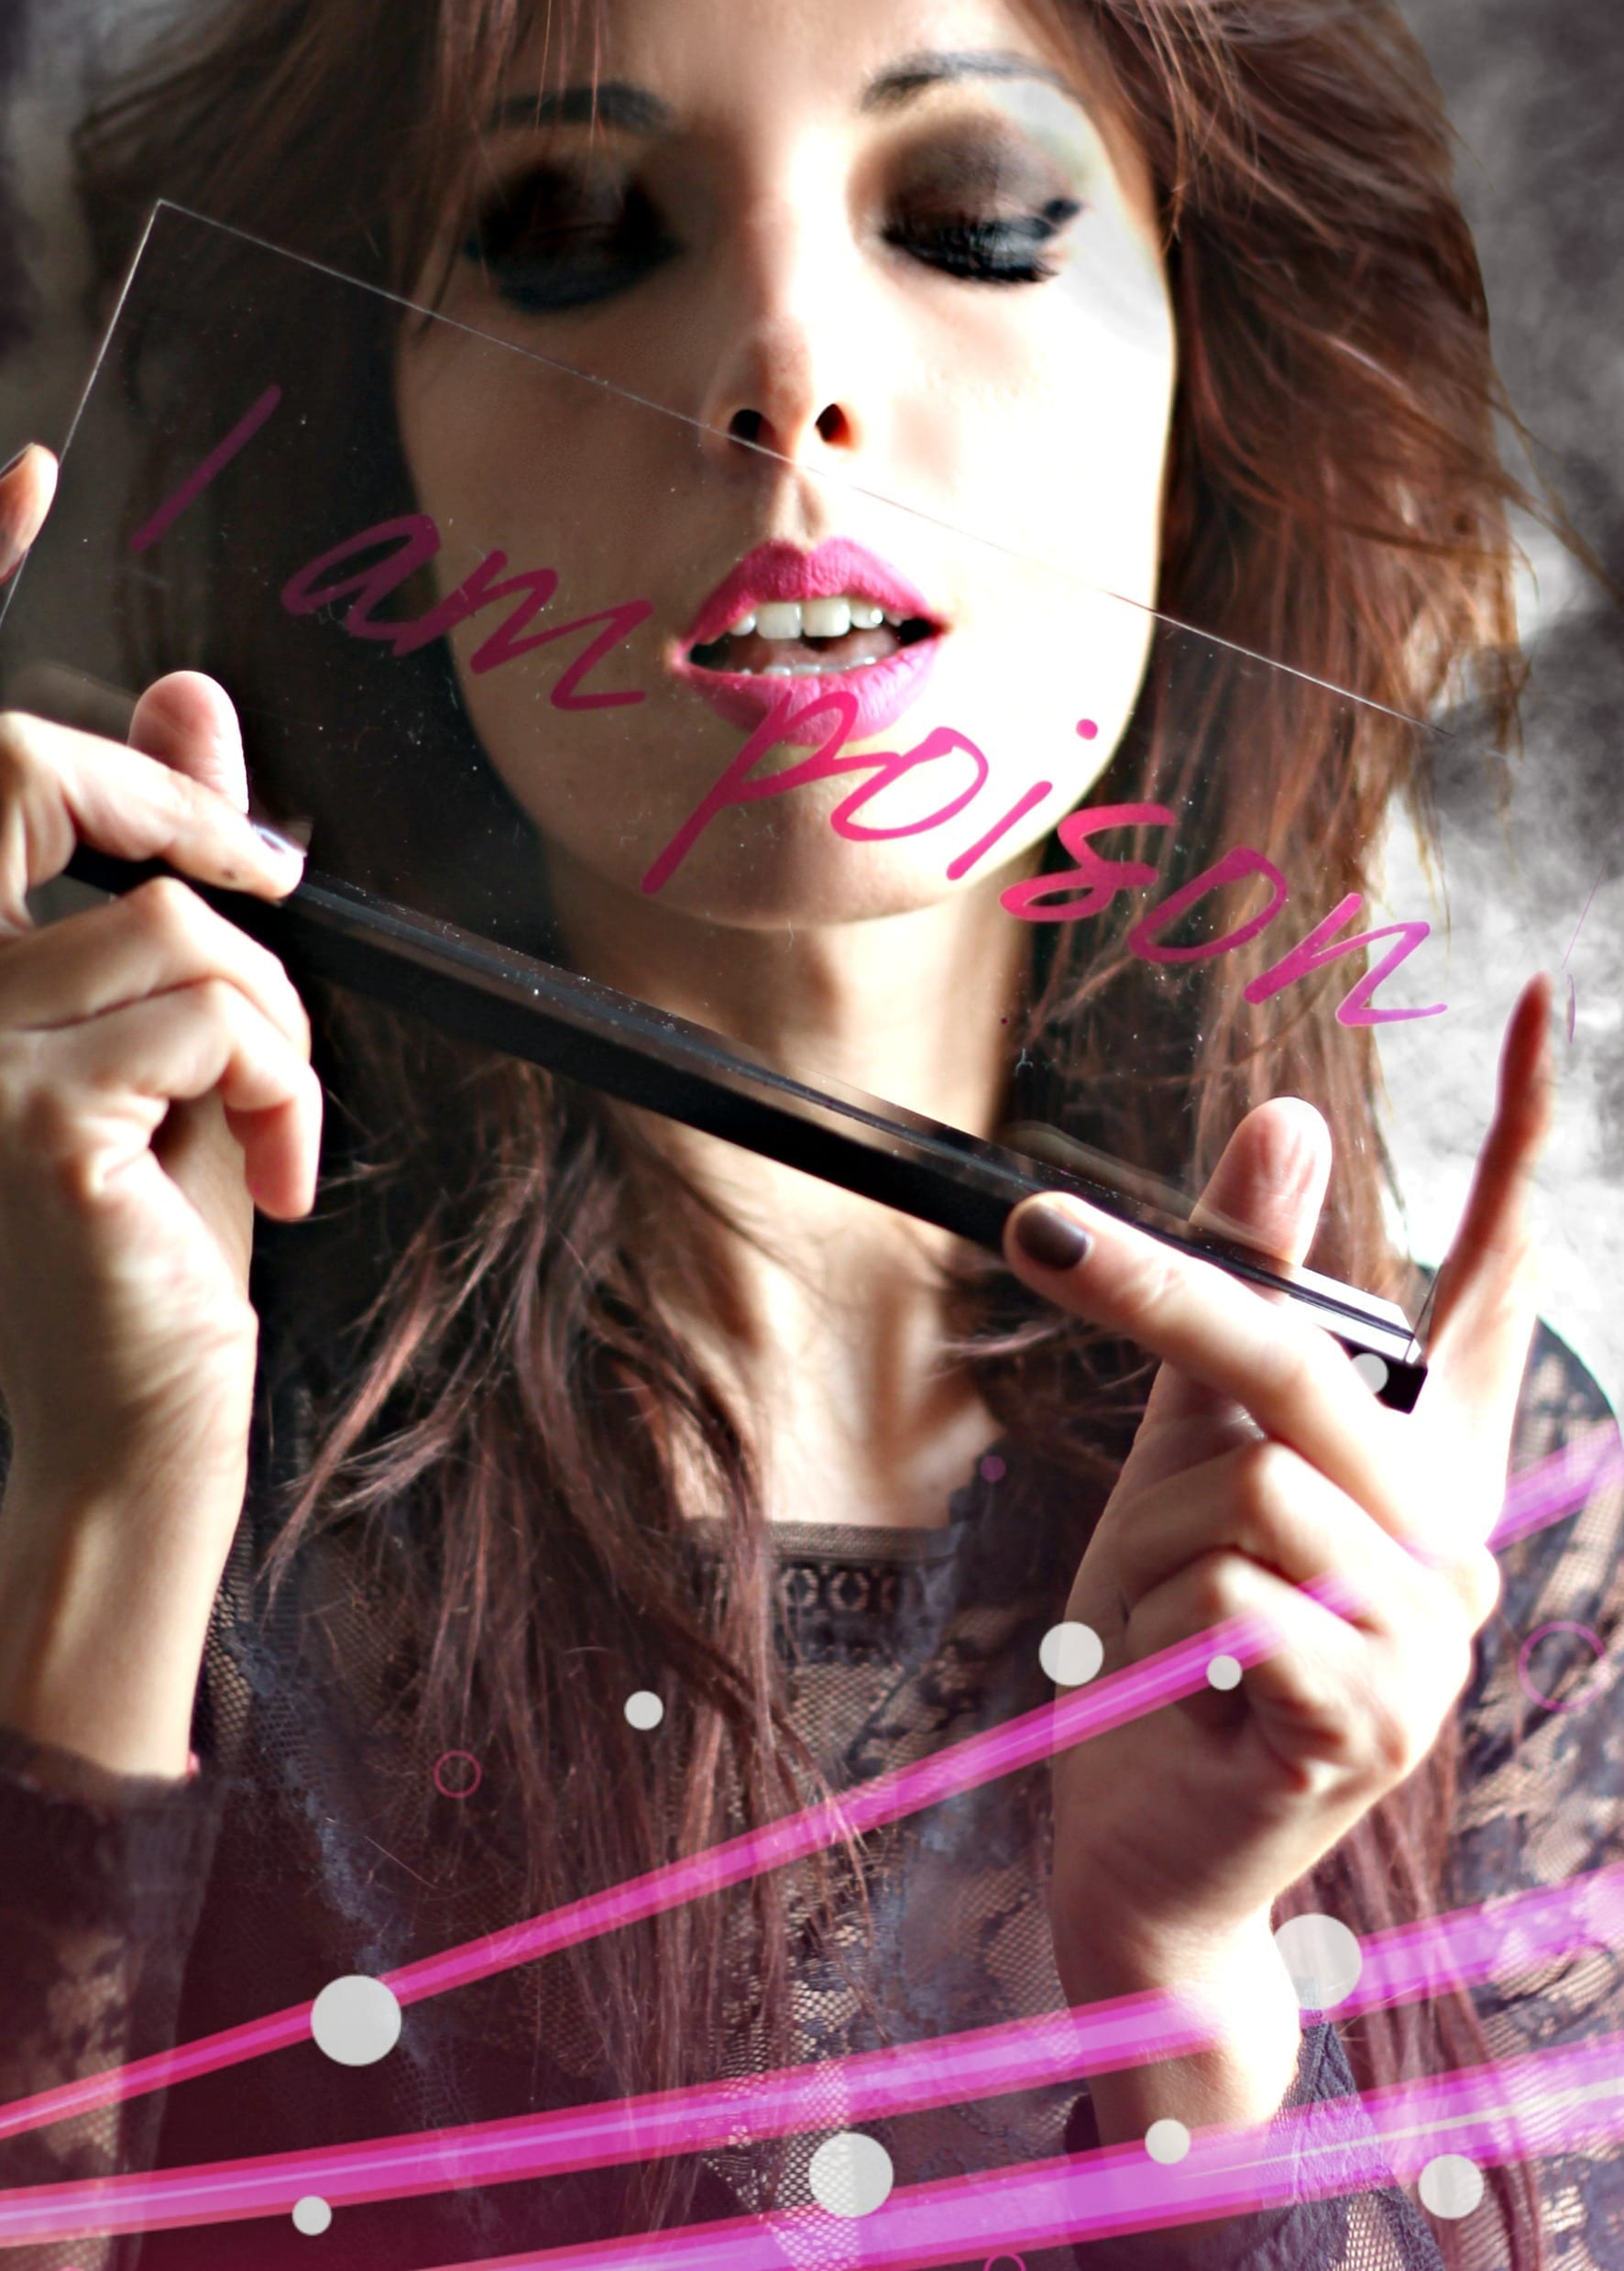 i am poison dior, theladycracy.it, elisa bellino, dior beauty blogger, dior parfum, profumi più buoni, dior perfums, dior poison, hypnotic poison, fashion blogger famose italia, fashion blog moda, fashion blogger italiane, fashion blog italia, theladycracy.it, elisa bellino